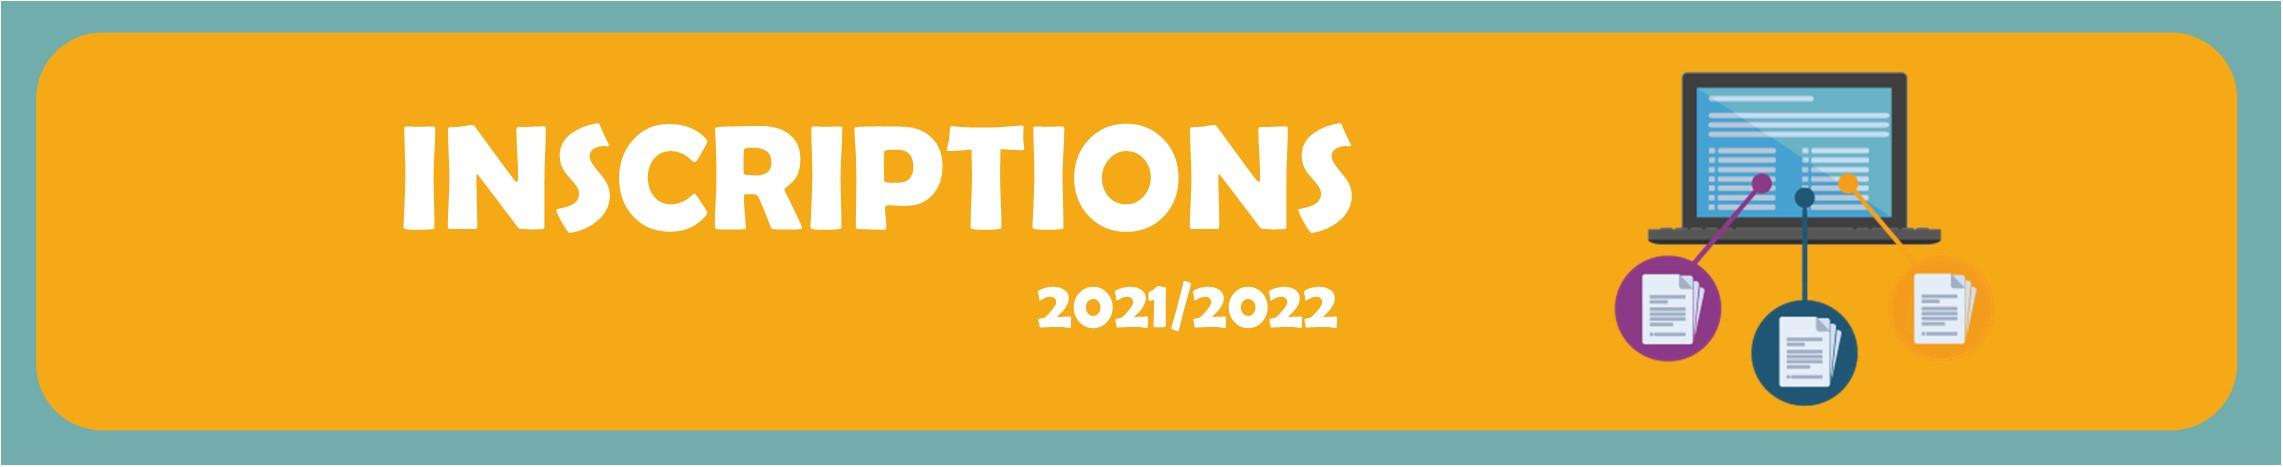 Information inscription saison sportive 2021/2022